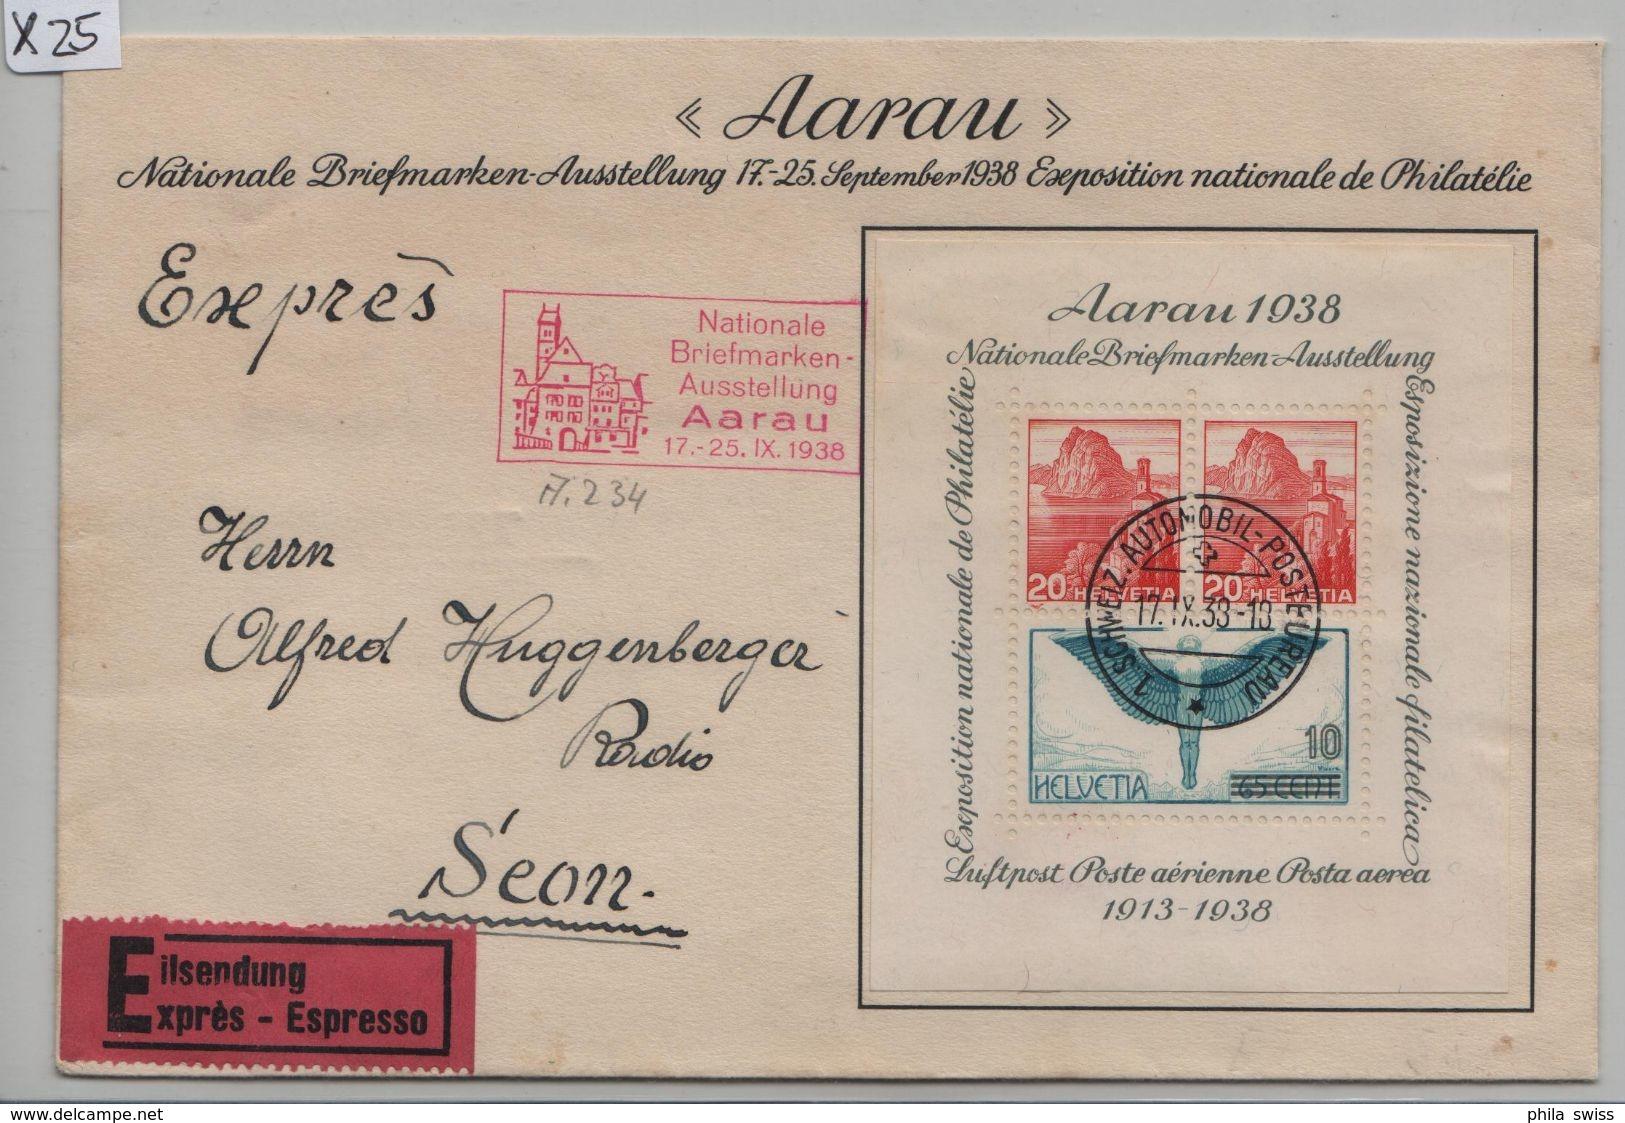 1938 Aarau Briefmarkenausstellung Exposition Block FDC Expres To Seon SBB W11/Bl. Roter Sonderstempel - Blocs & Feuillets